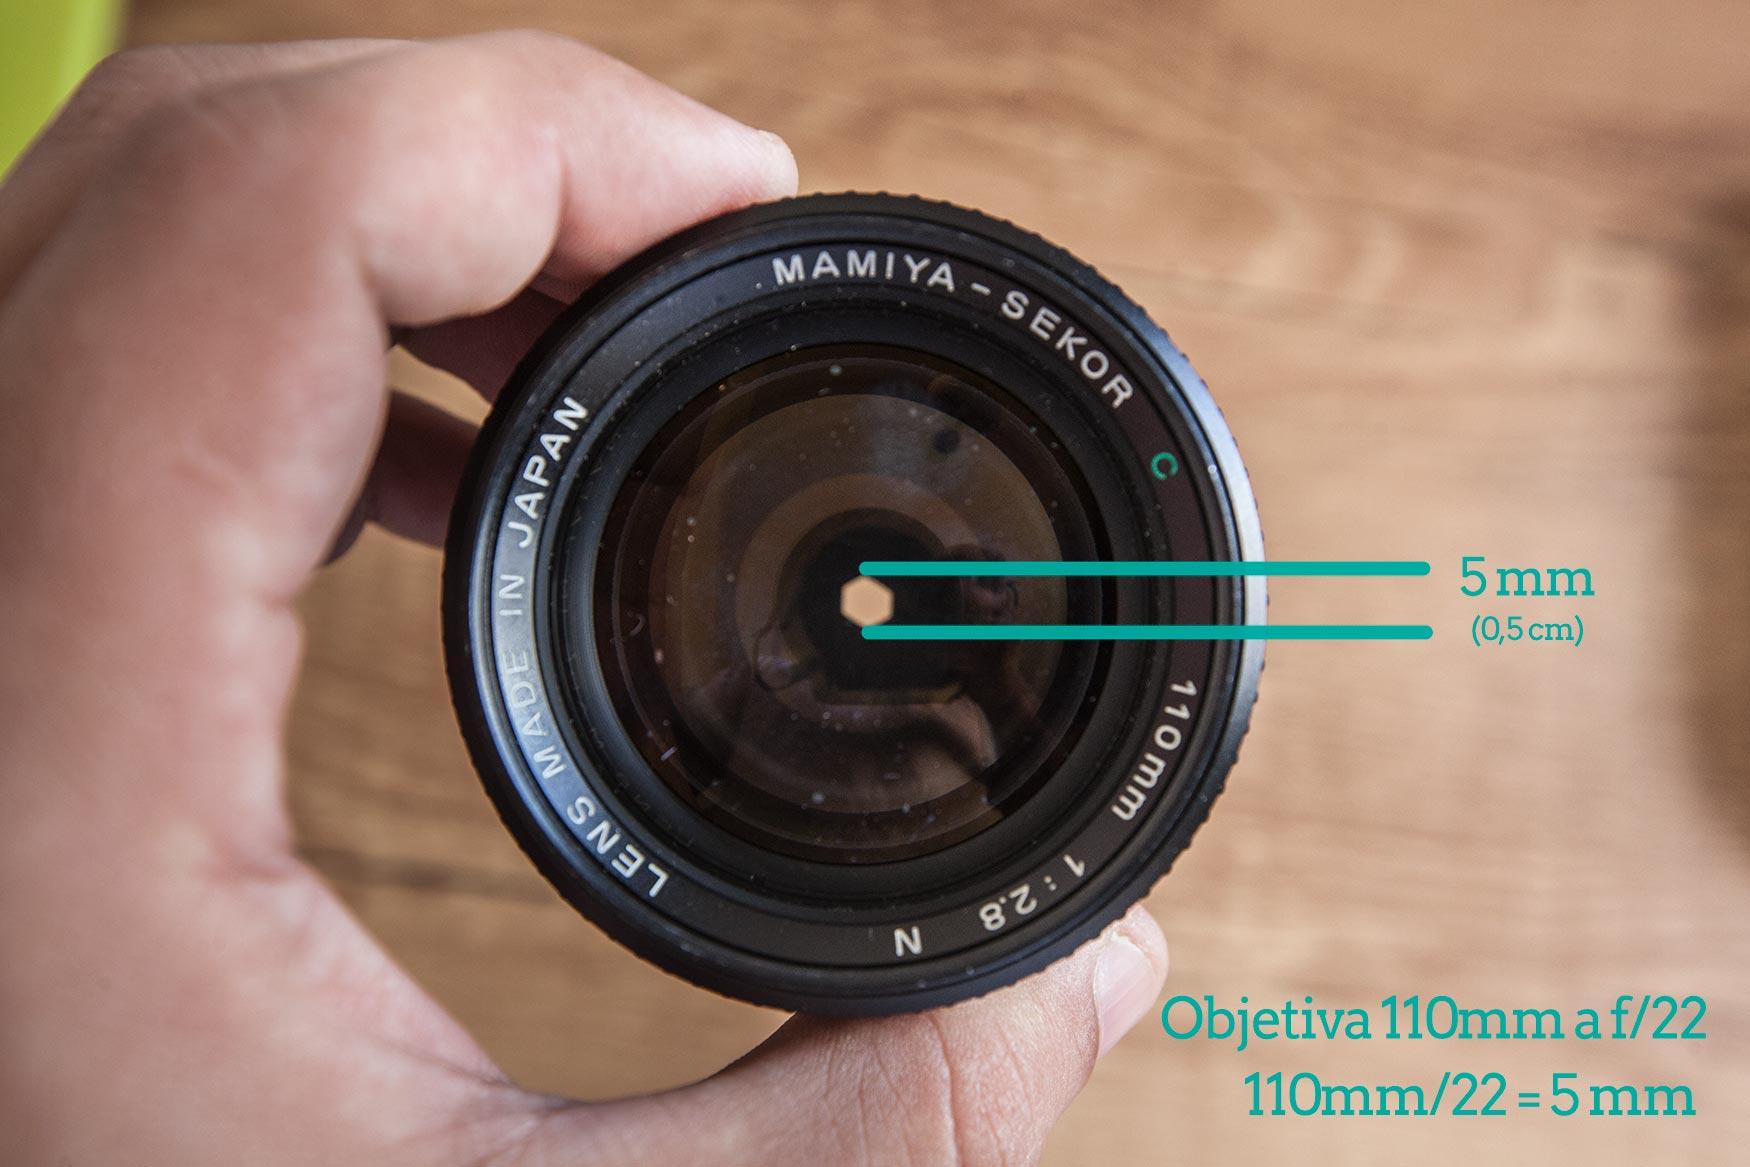 32d07a756f Diafragma e Abertura da Lente » Como funciona » Aprenda Fotografia